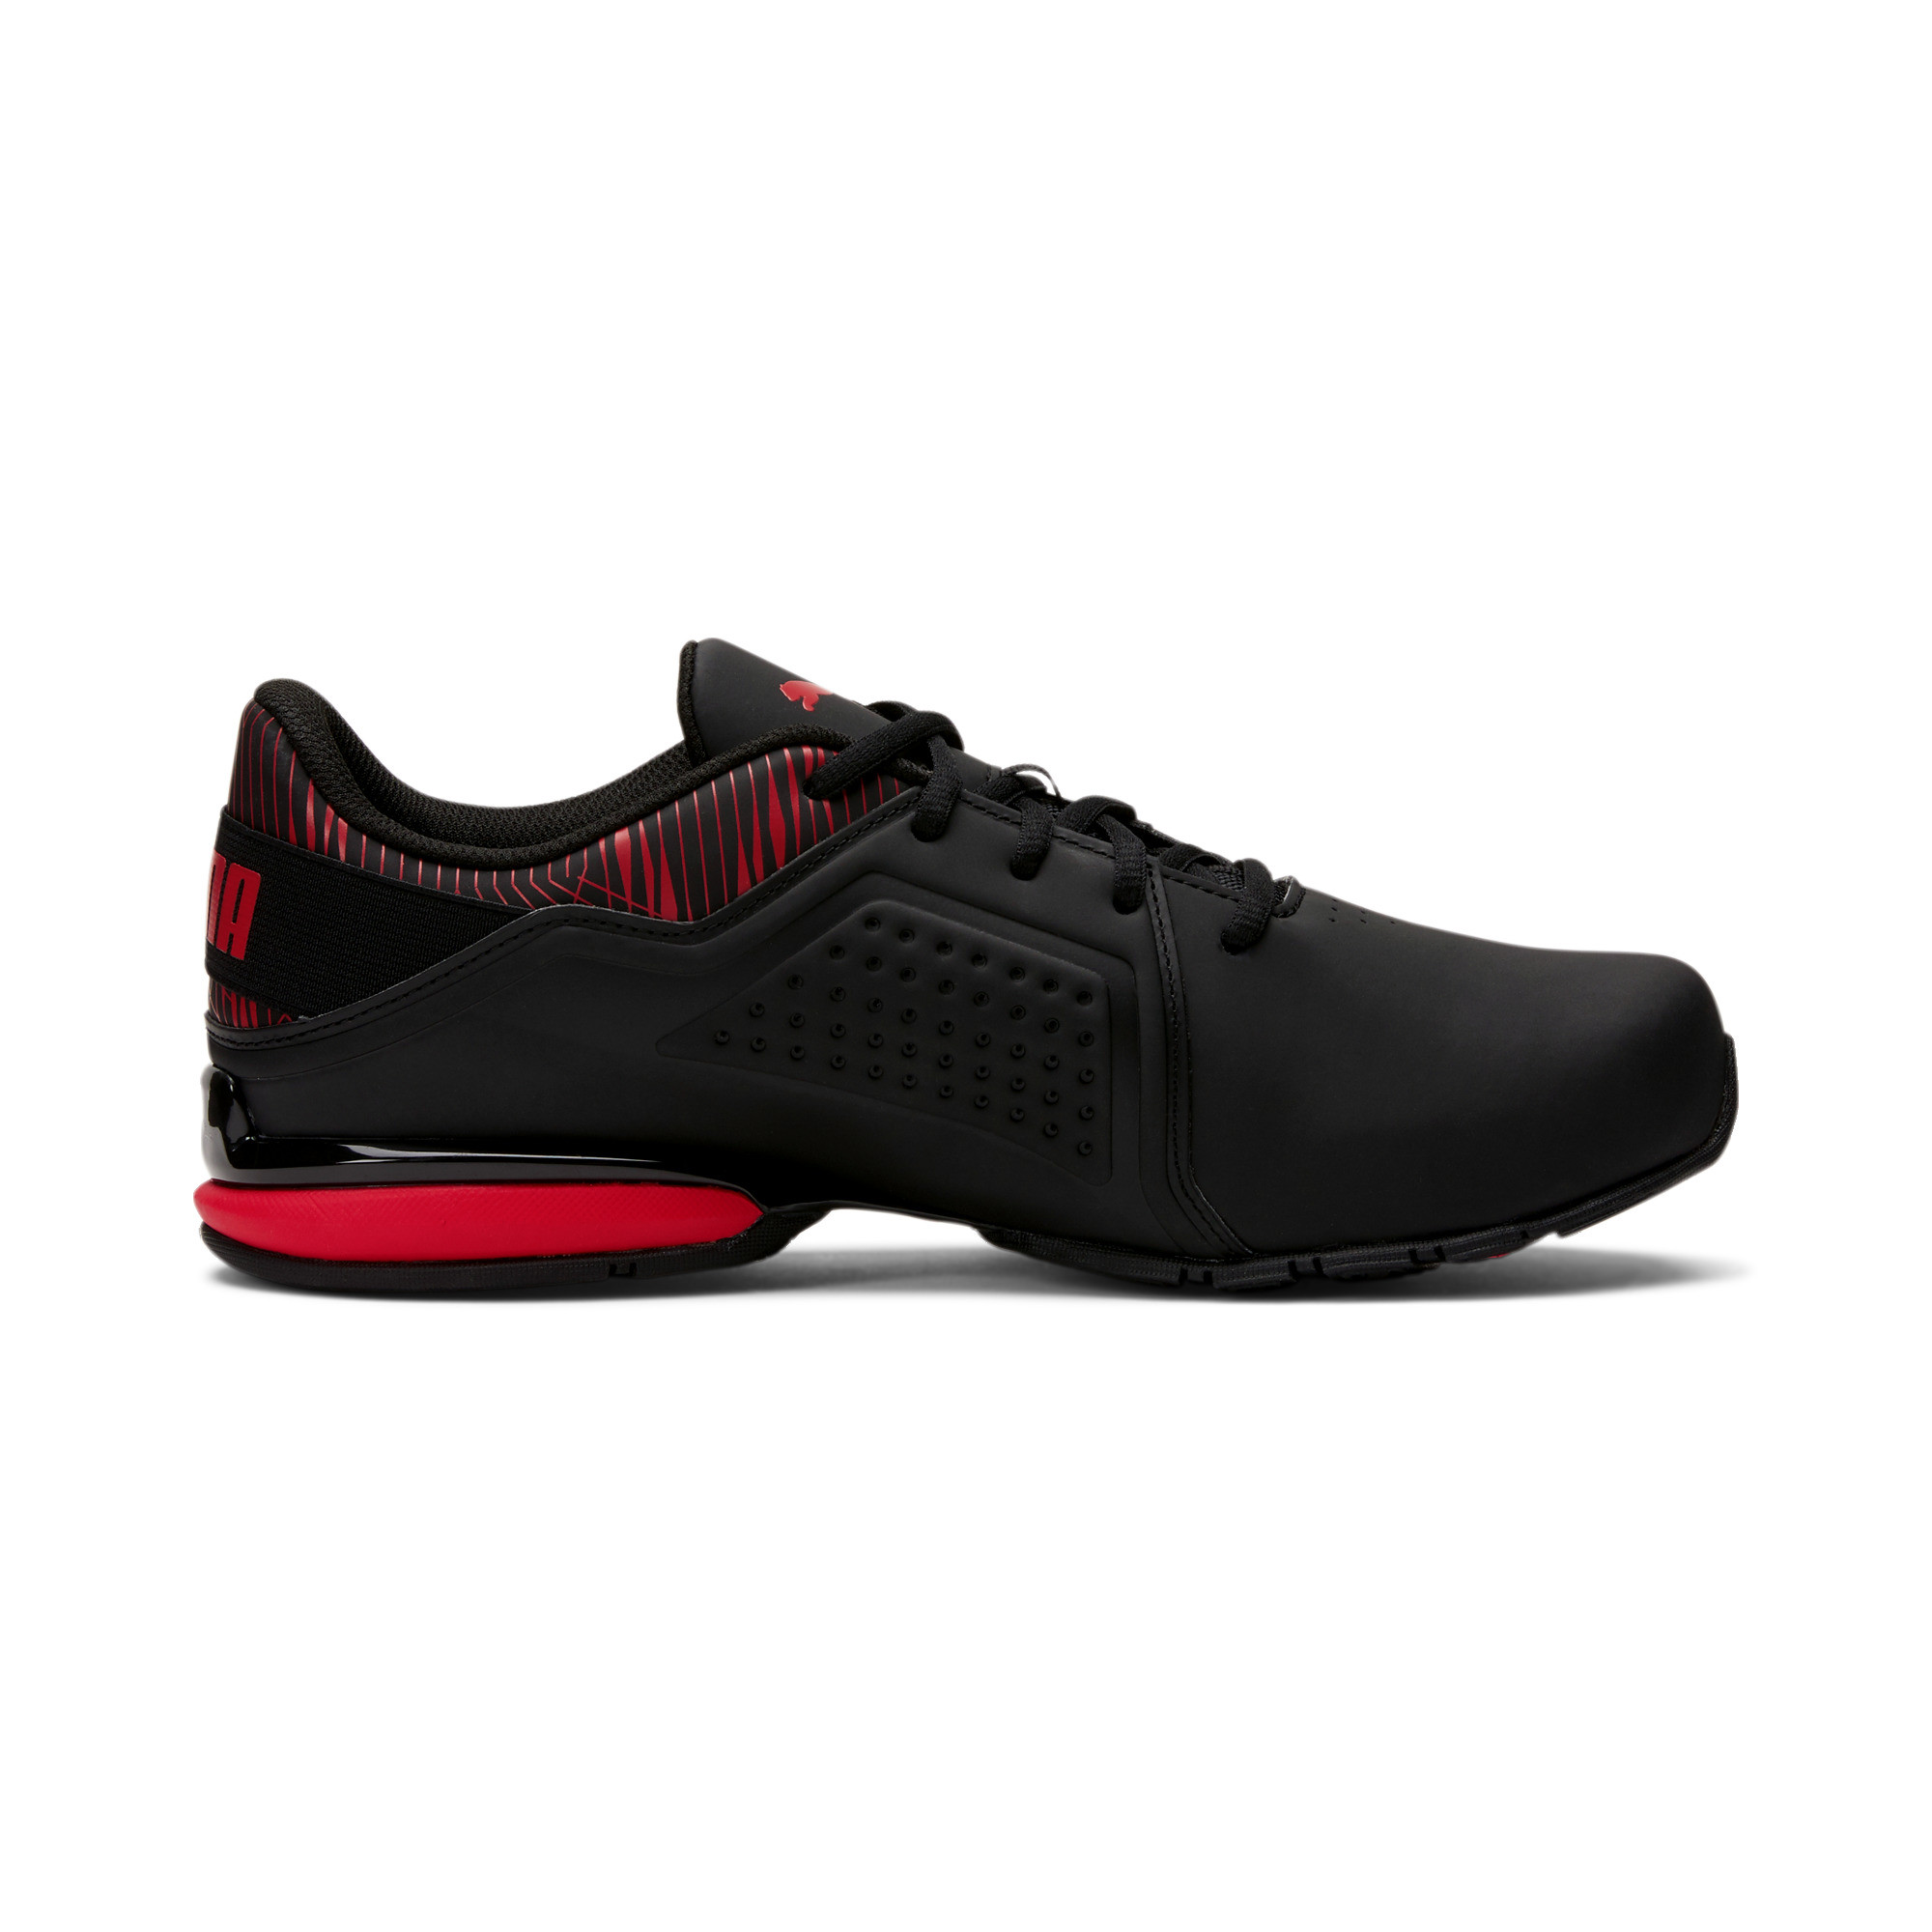 thumbnail 11 - PUMA Men's Viz Runner Graphic Sneakers